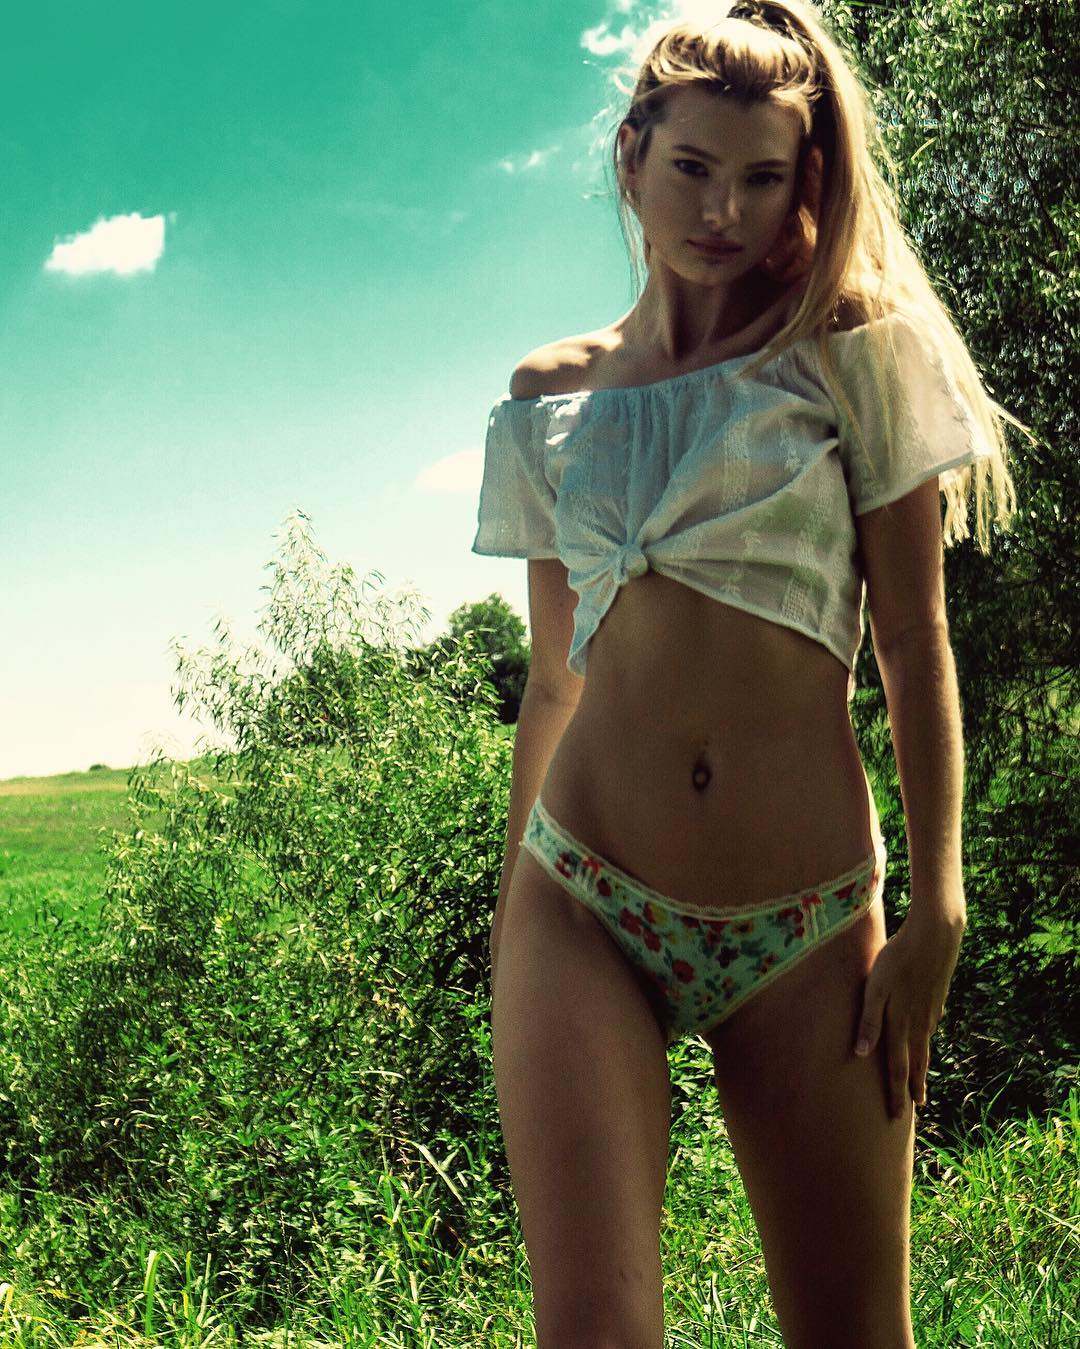 Instagram Jessie Keener naked (19 images), Paparazzi